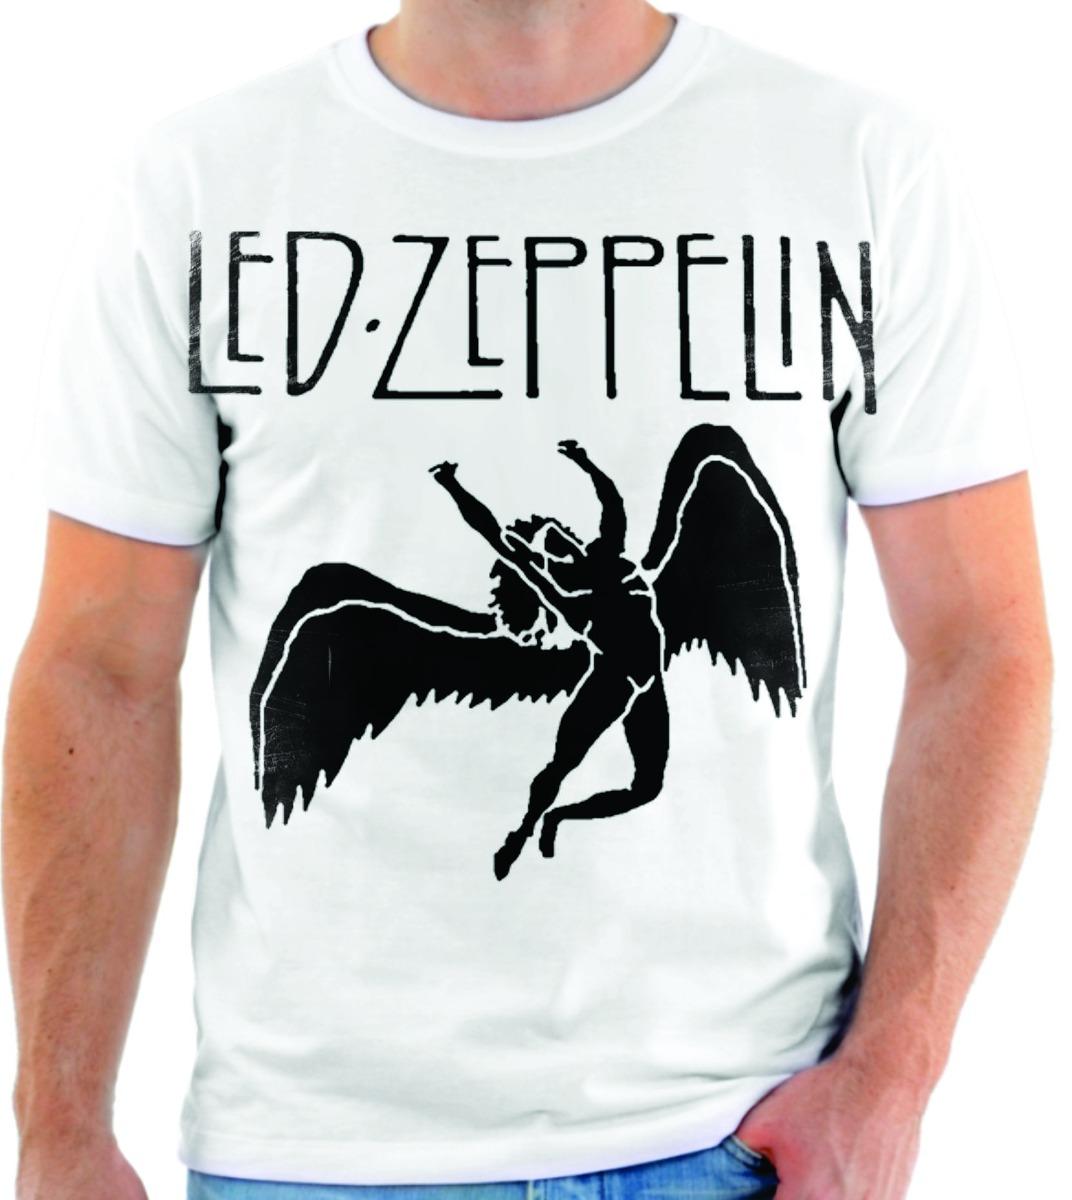 de13de454 camisa camiseta blusa led zeppelin 01. Carregando zoom.